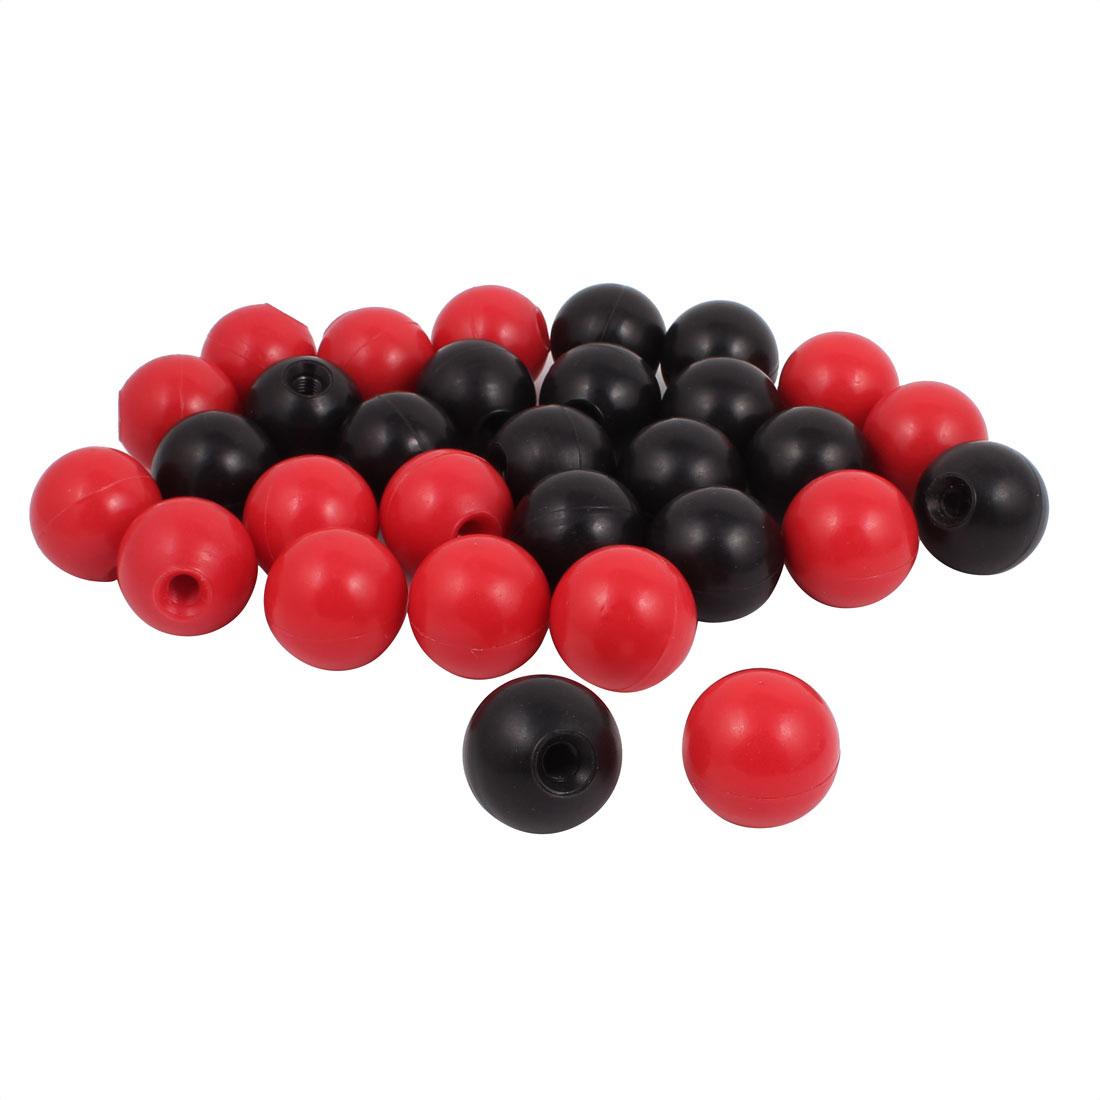 30 Pcs M10 x 40mm Plastic Ball Machine Tool Accessories Console Handle Black Red